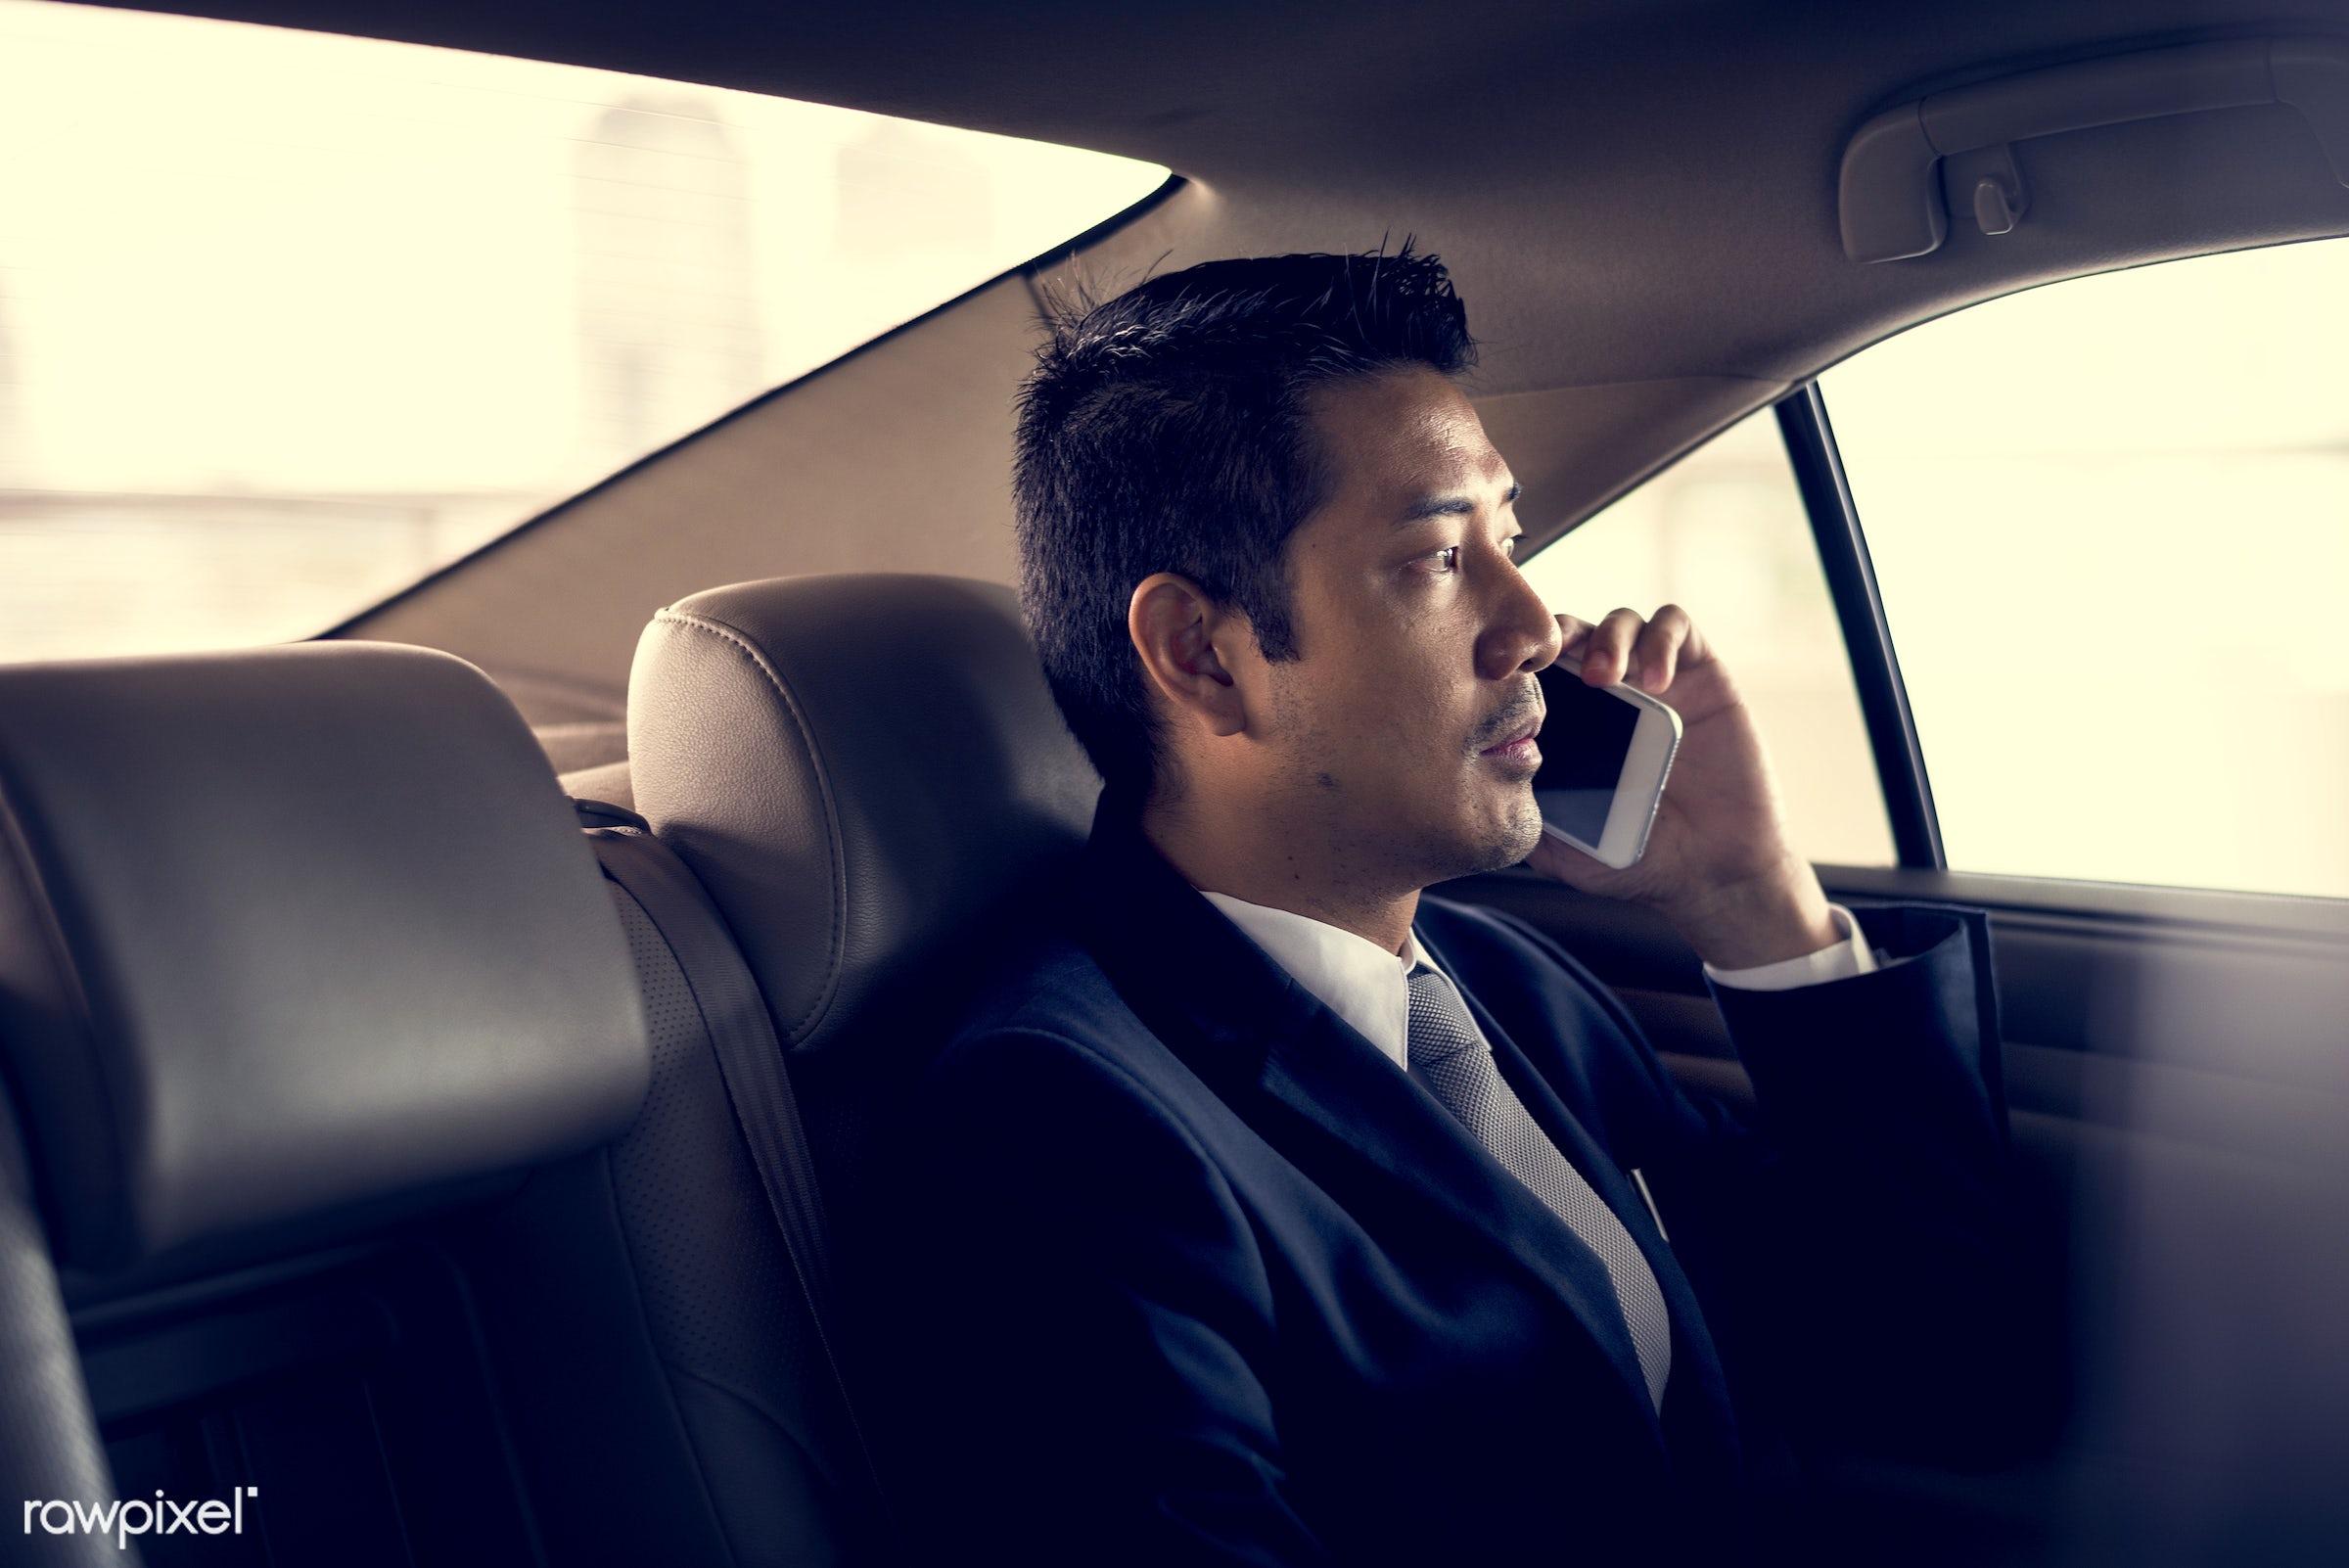 adult, business, businessman, businessmen, call, candid, car, cellphone, communication, corporate, device, digital device,...